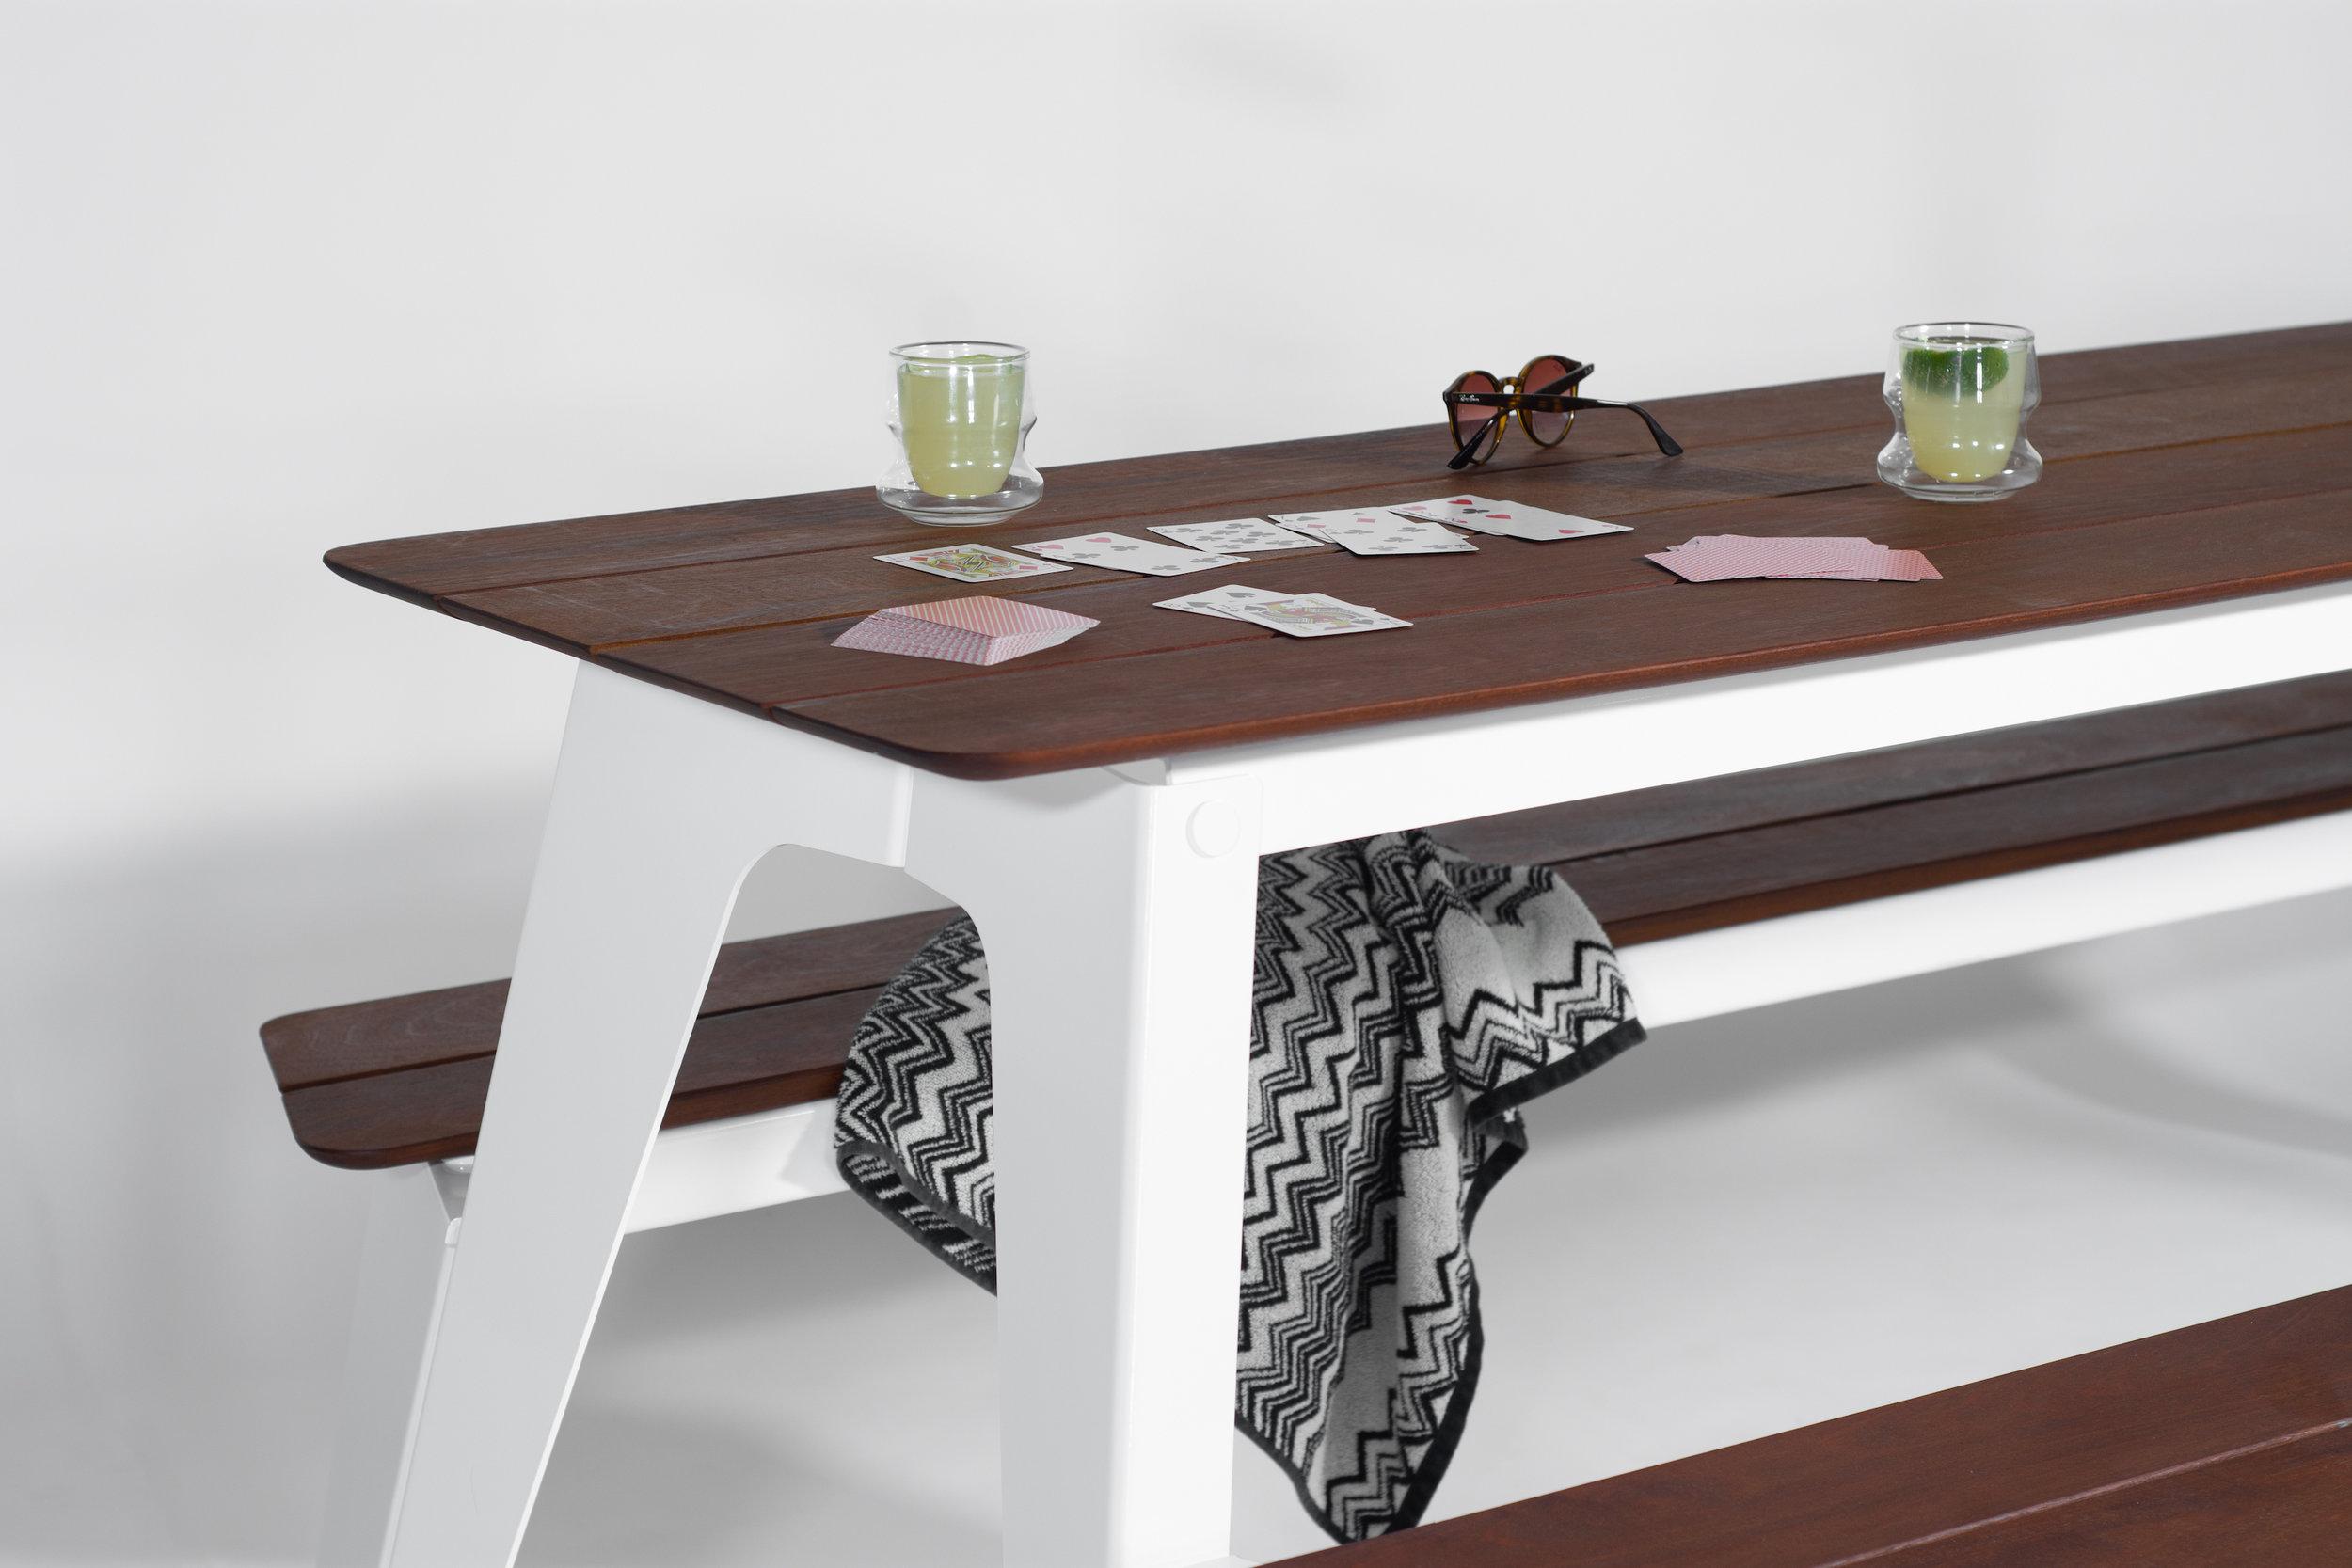 Rambler Picnic Table, Playing Cards and Margaritas